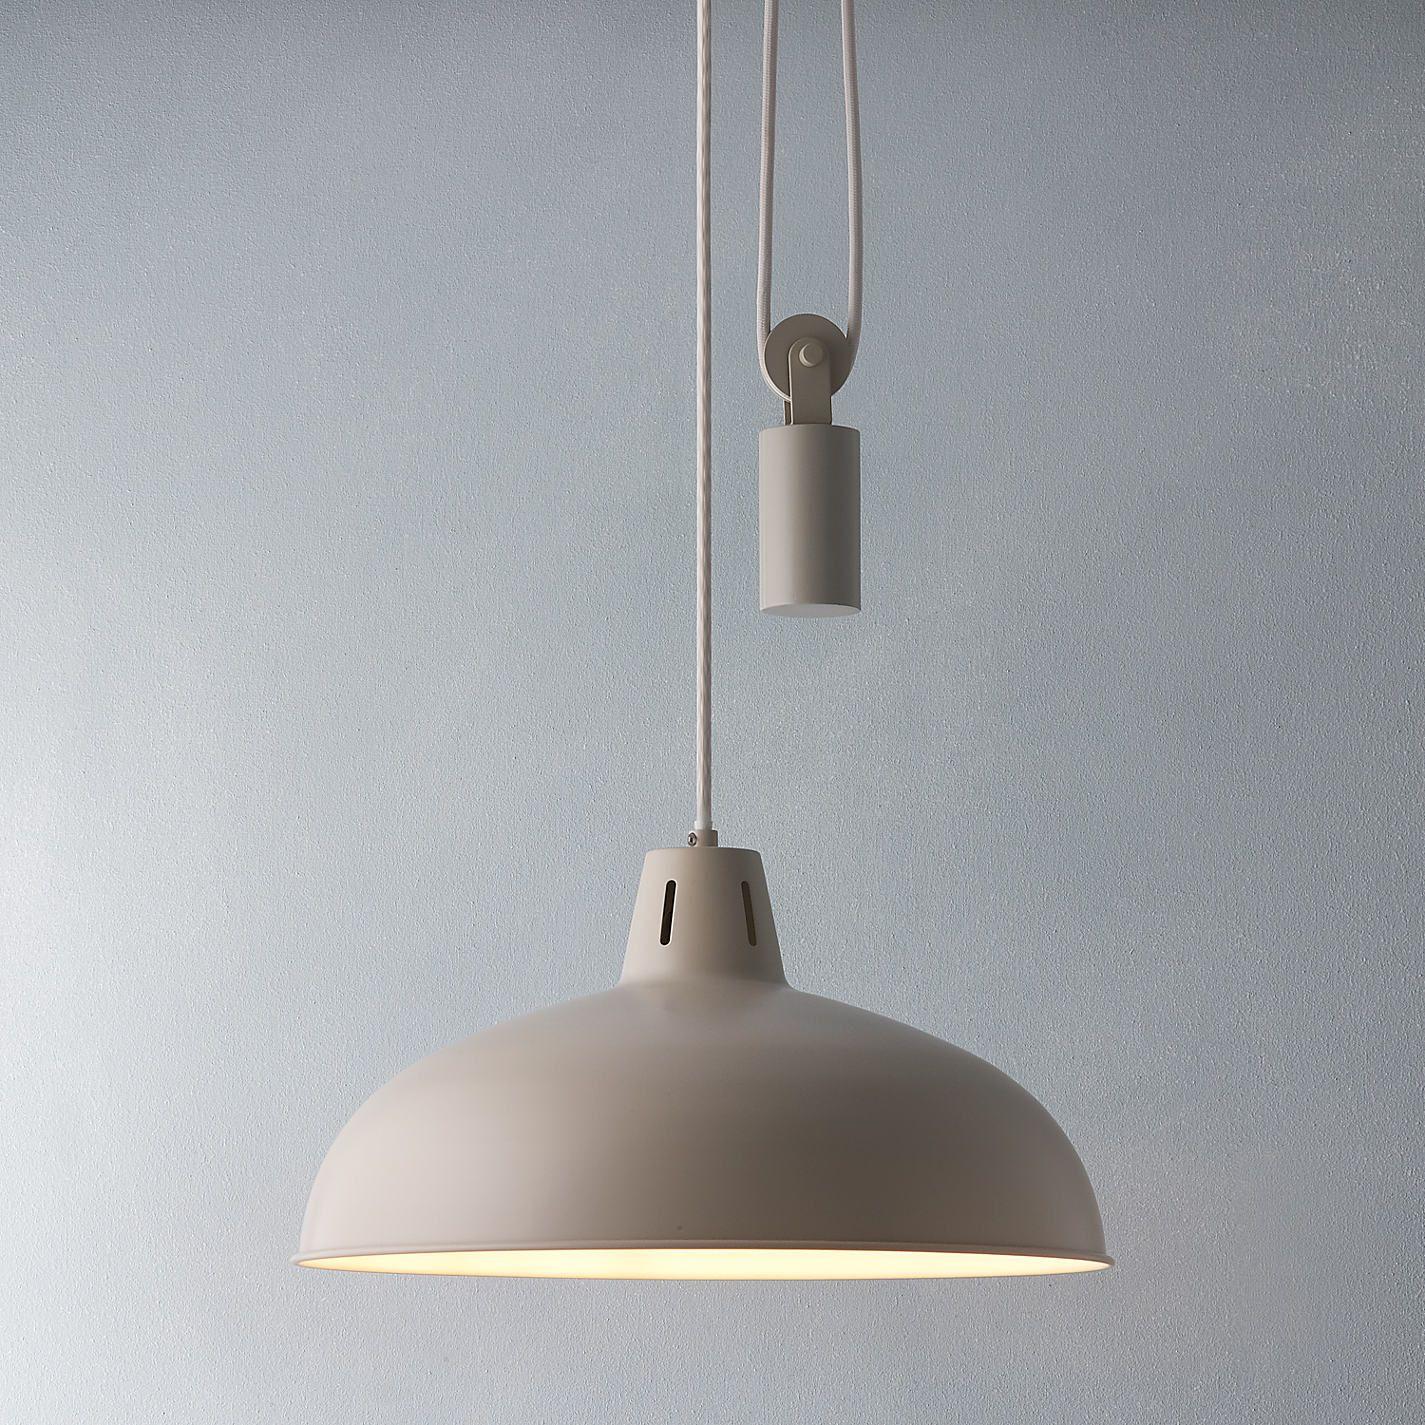 buy product retractable pendant light john lewis brigitta. Black Bedroom Furniture Sets. Home Design Ideas